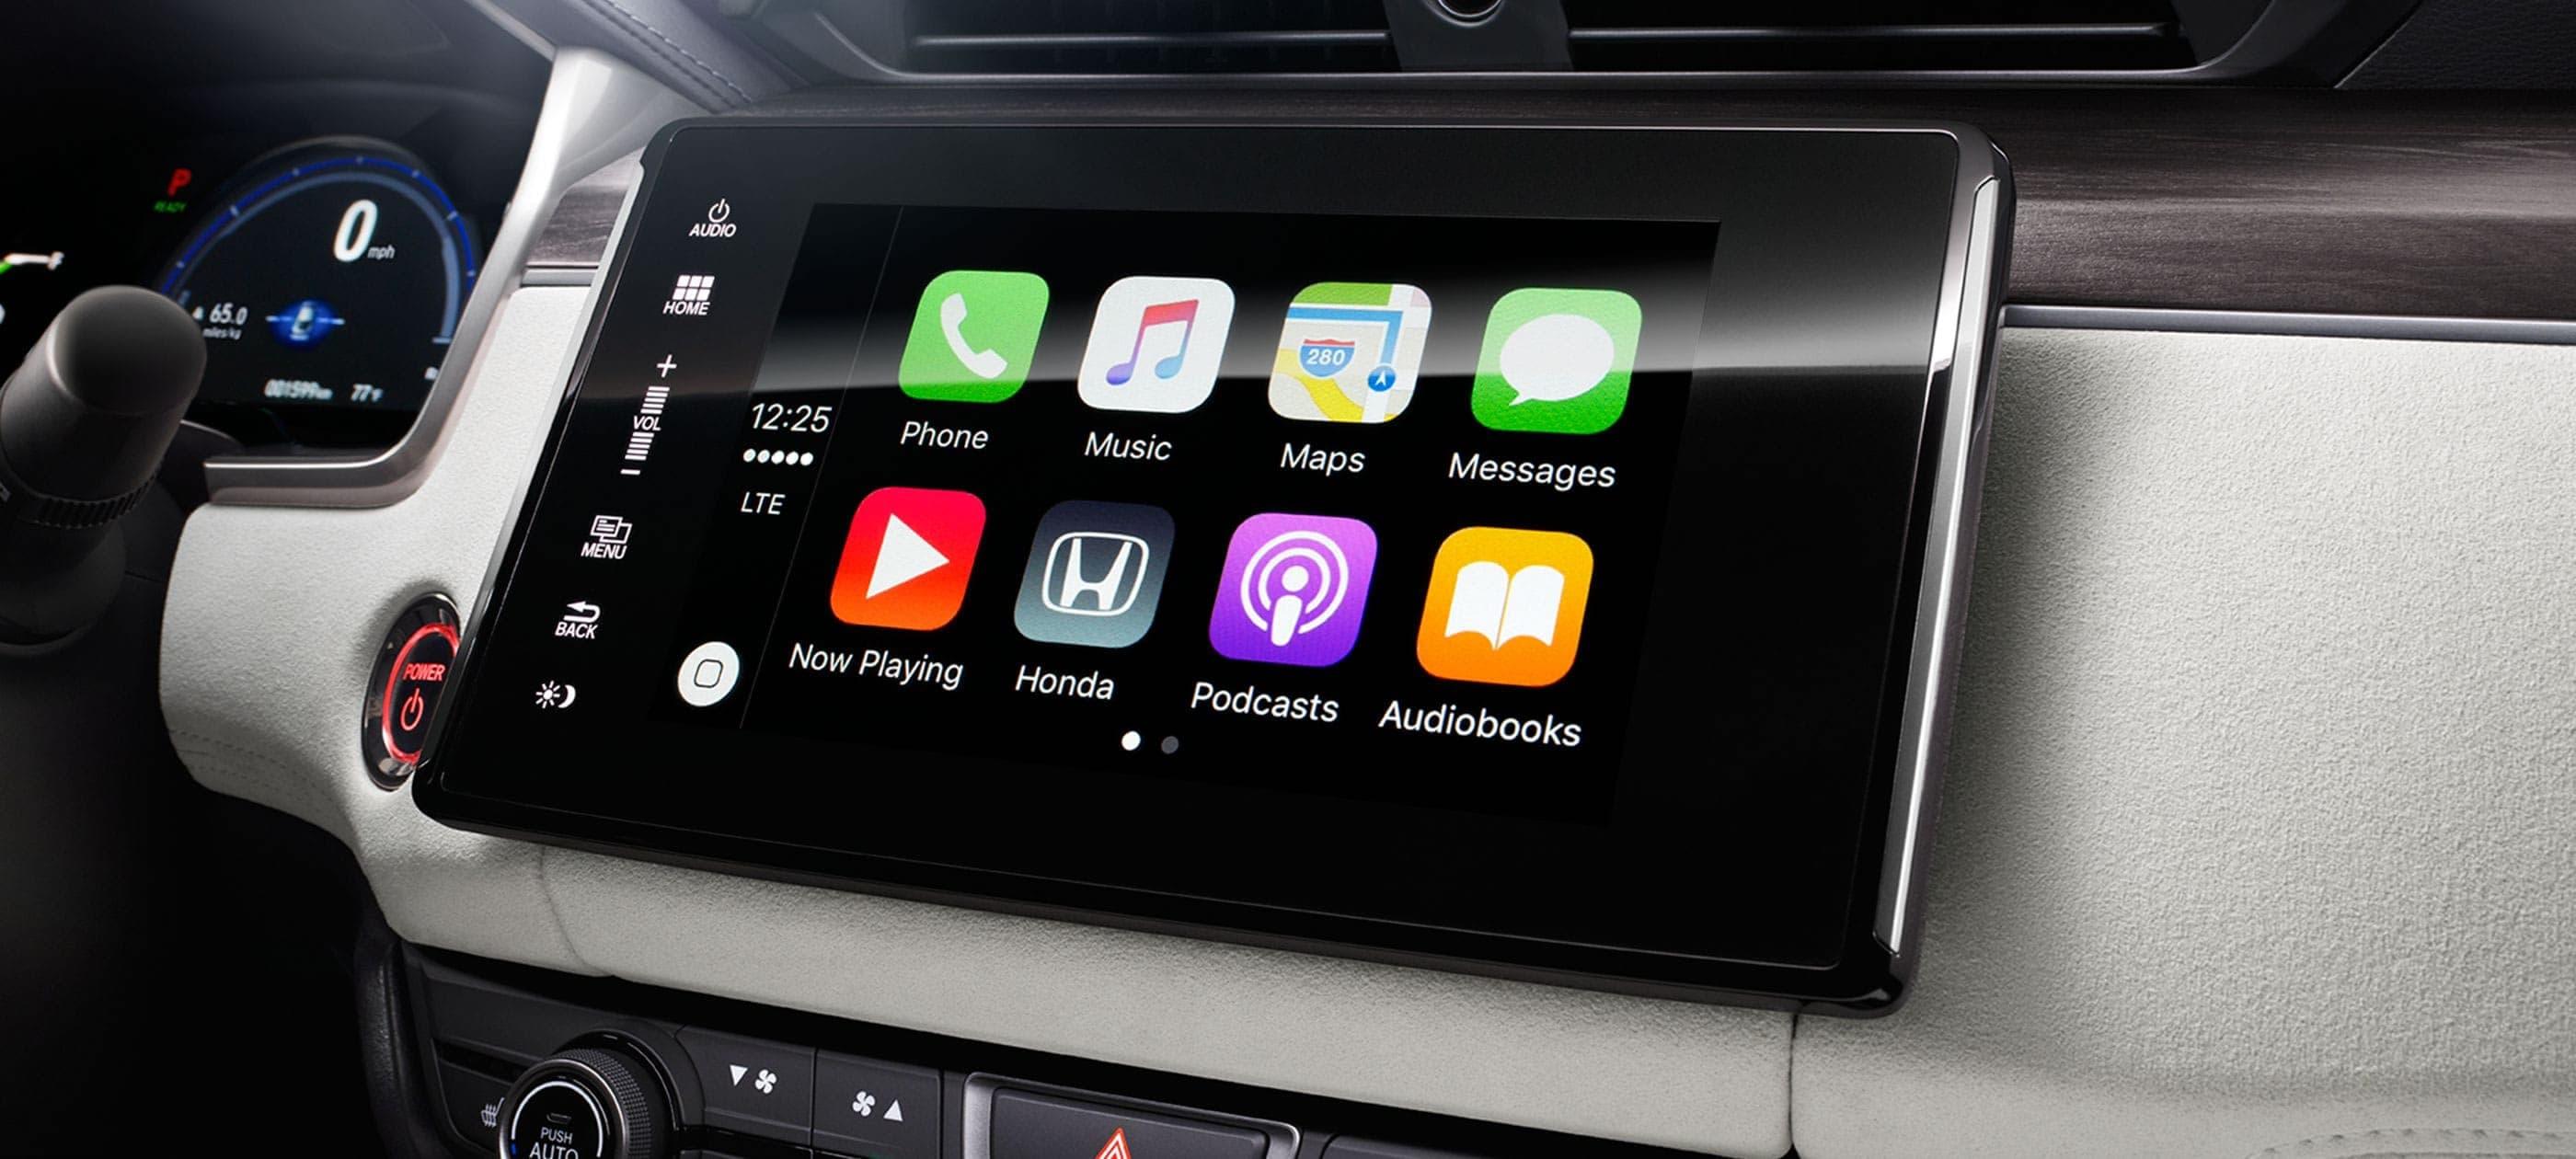 Integración con Apple CarPlay™